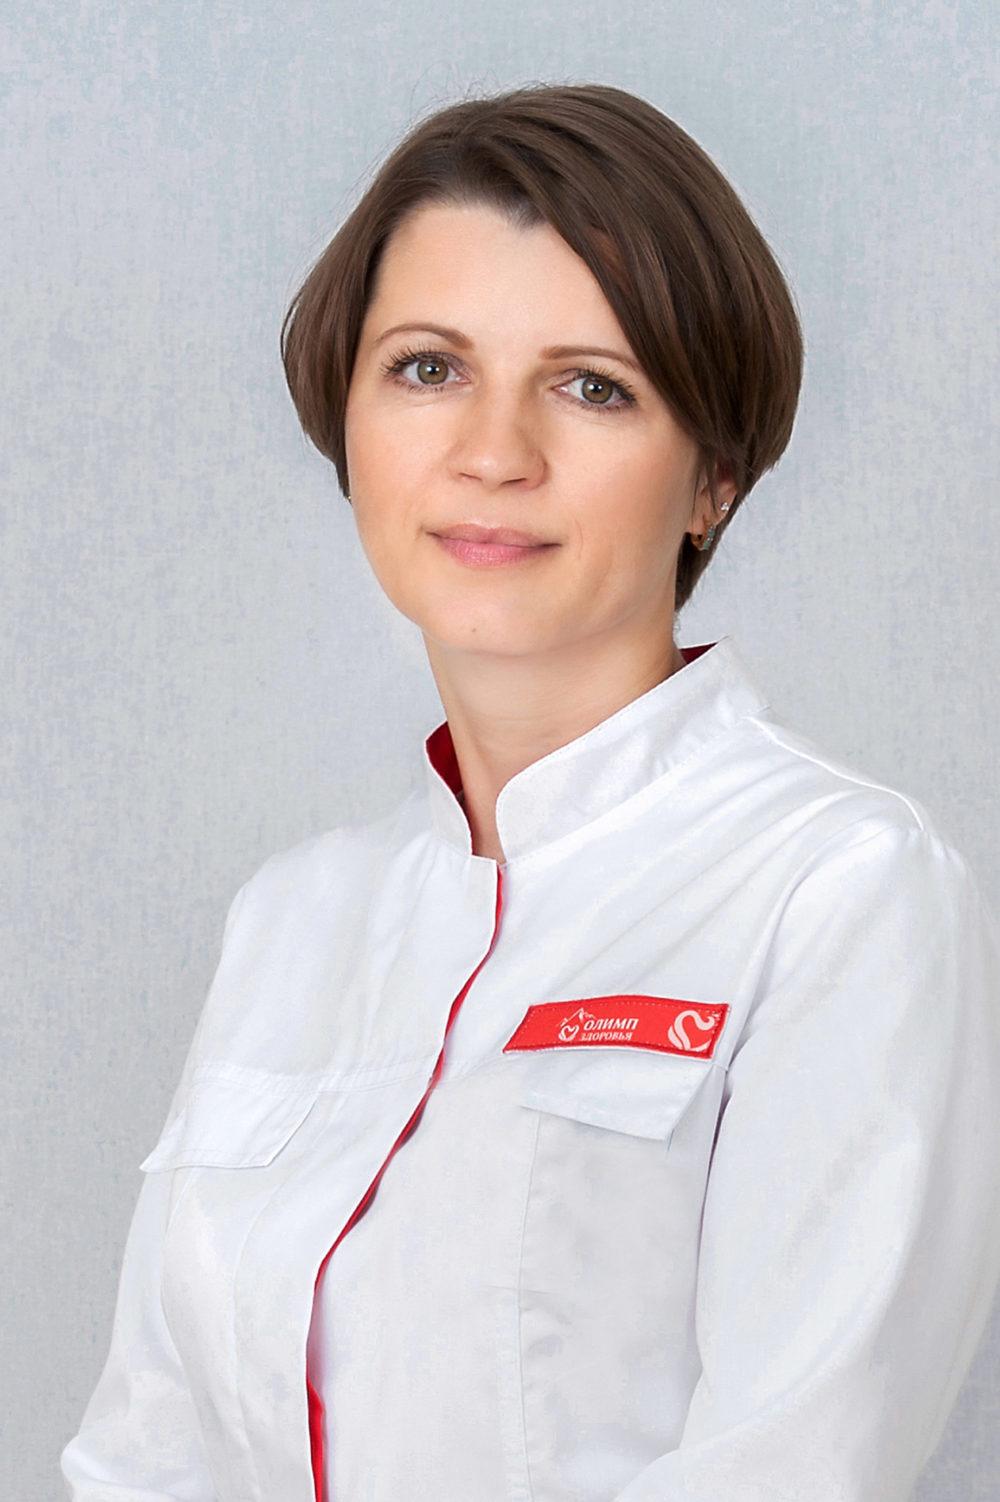 Котлярова Оксана Николаевна